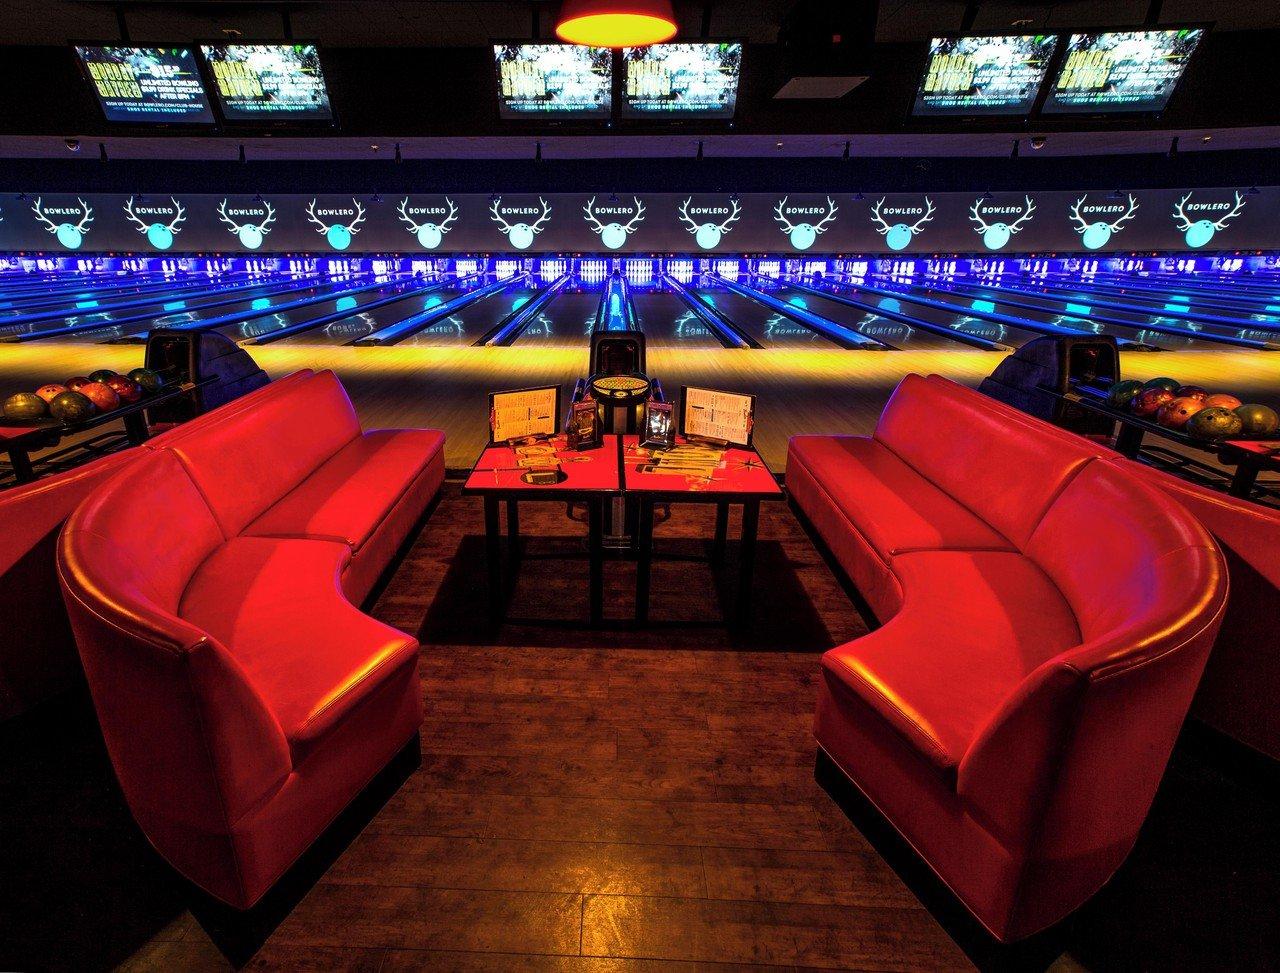 Rest der Welt corporate event venues Partyraum Bowlero Woodland Hills #270(CA) image 1